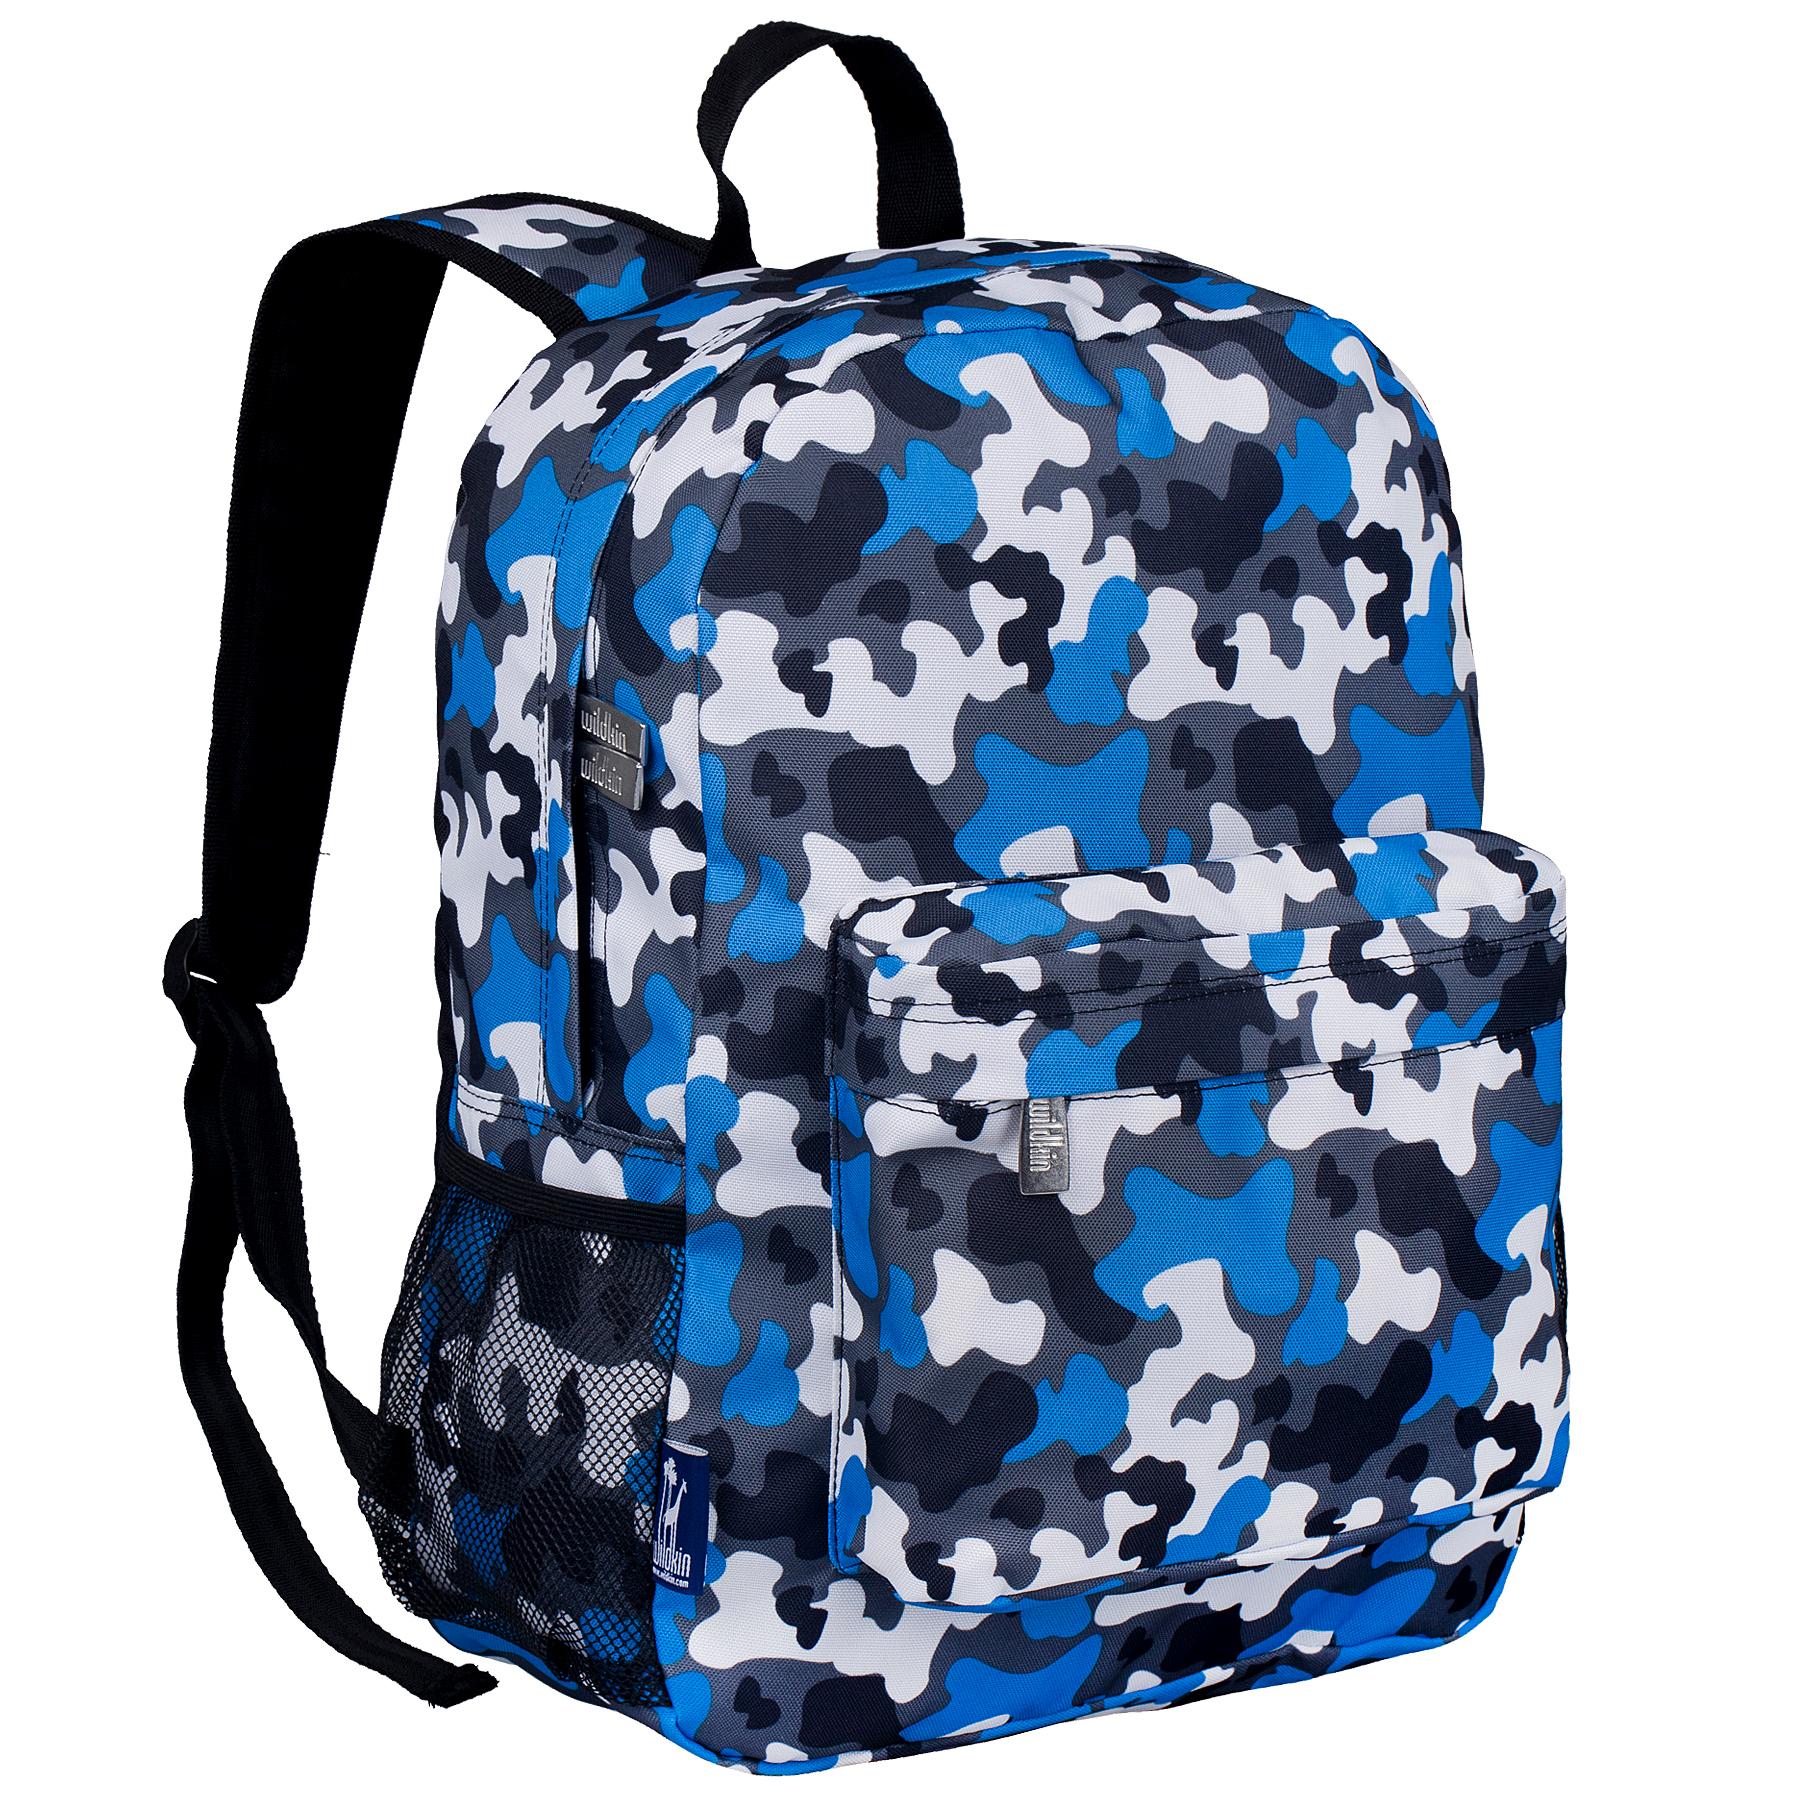 Crackerjack Backpacks